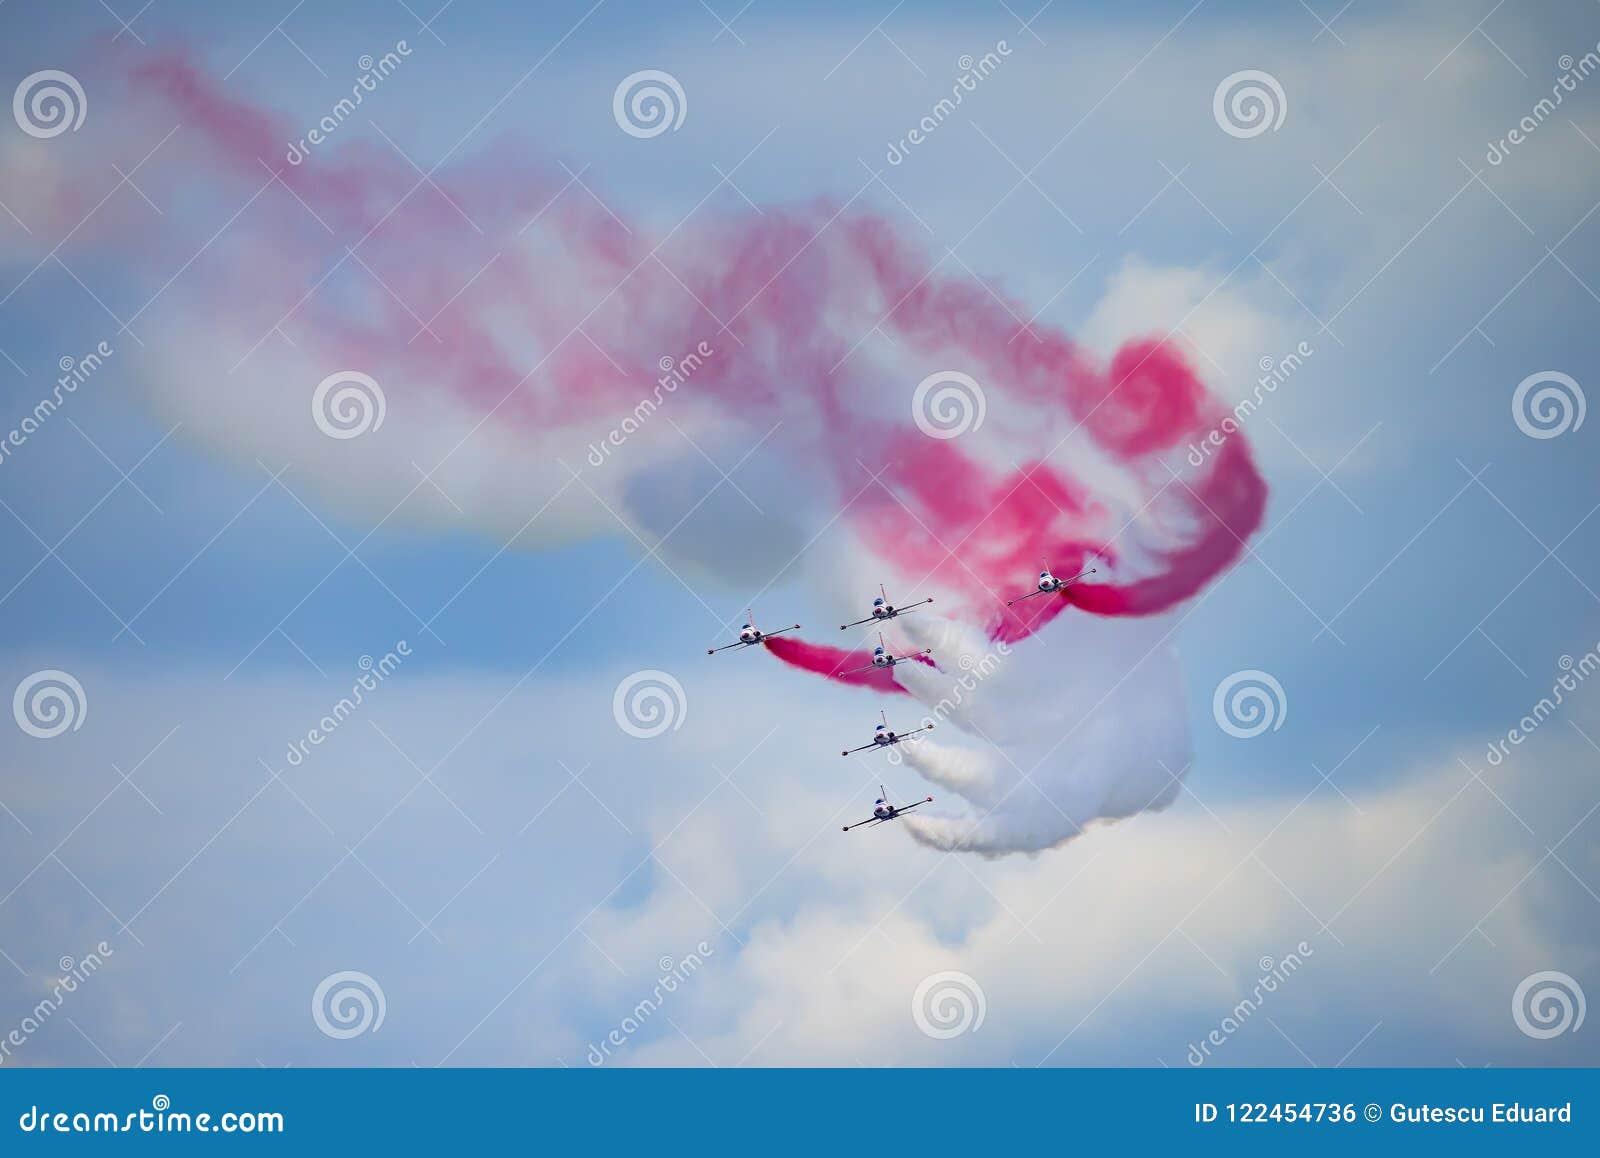 Bucharest international air show BIAS, white red sparks Poland aerobatic display team.